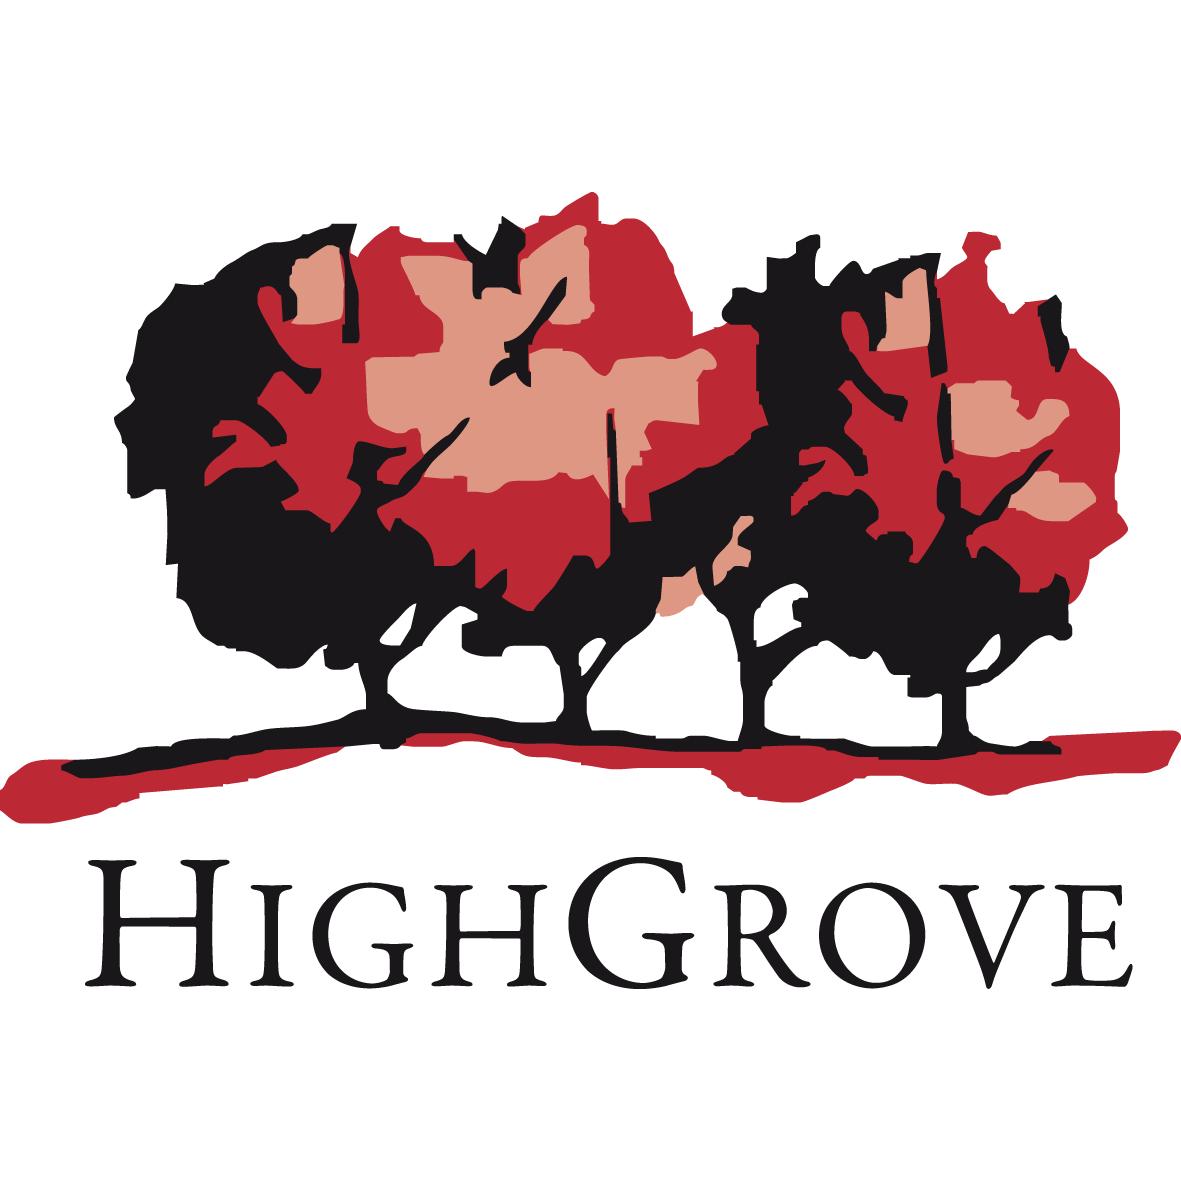 Commercial Landscaping Atlanta Austell Ga: HighGrove Partners 7730 The Bluffs Austell, GA Landscape